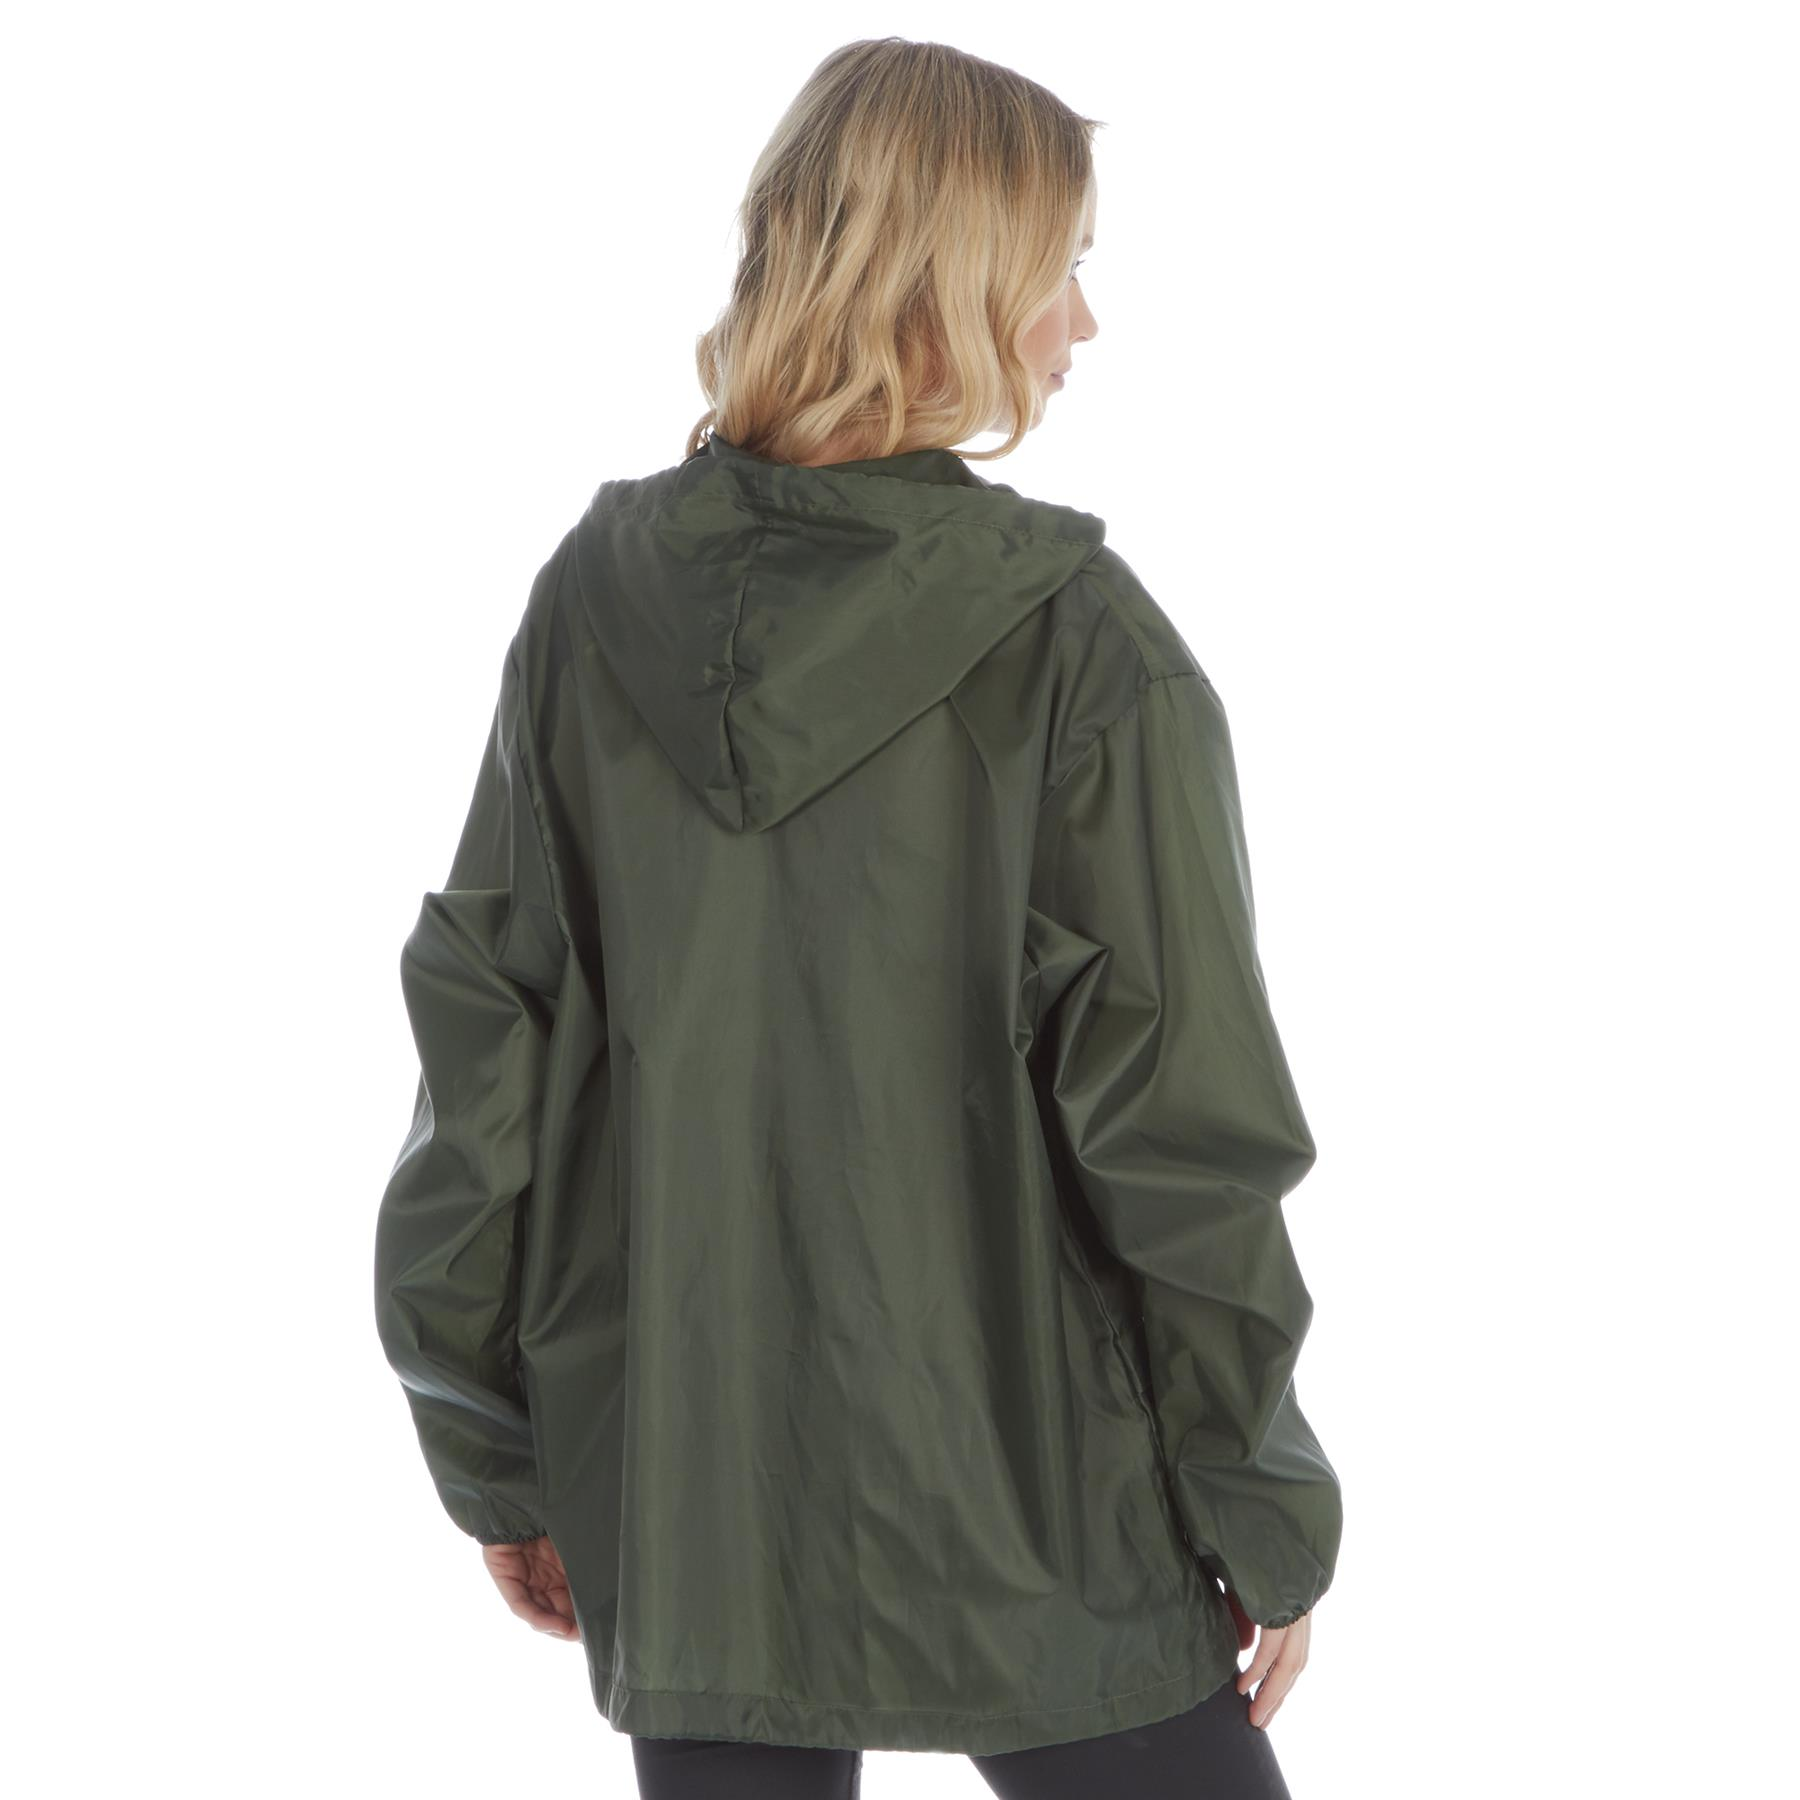 Men//Women Plain Rain Coat Mac Kagoul Jacket Water Proof Hooded Cagoul Adults Pac